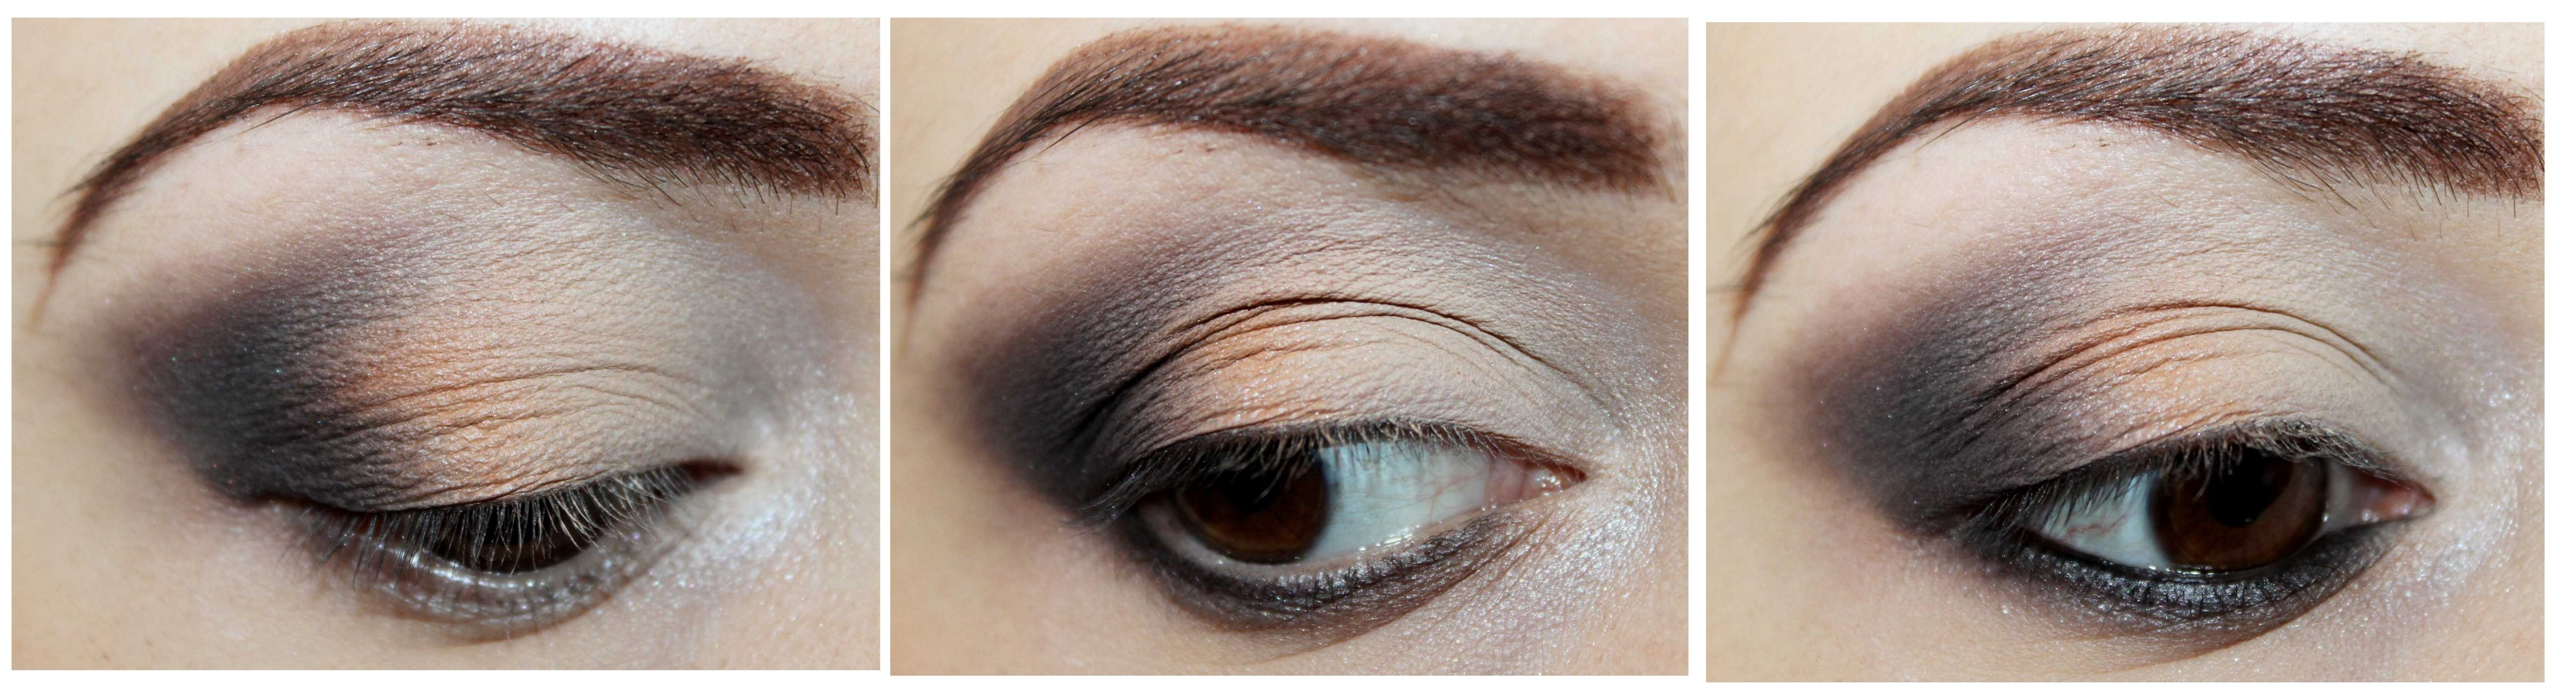 Elegancki makijaż